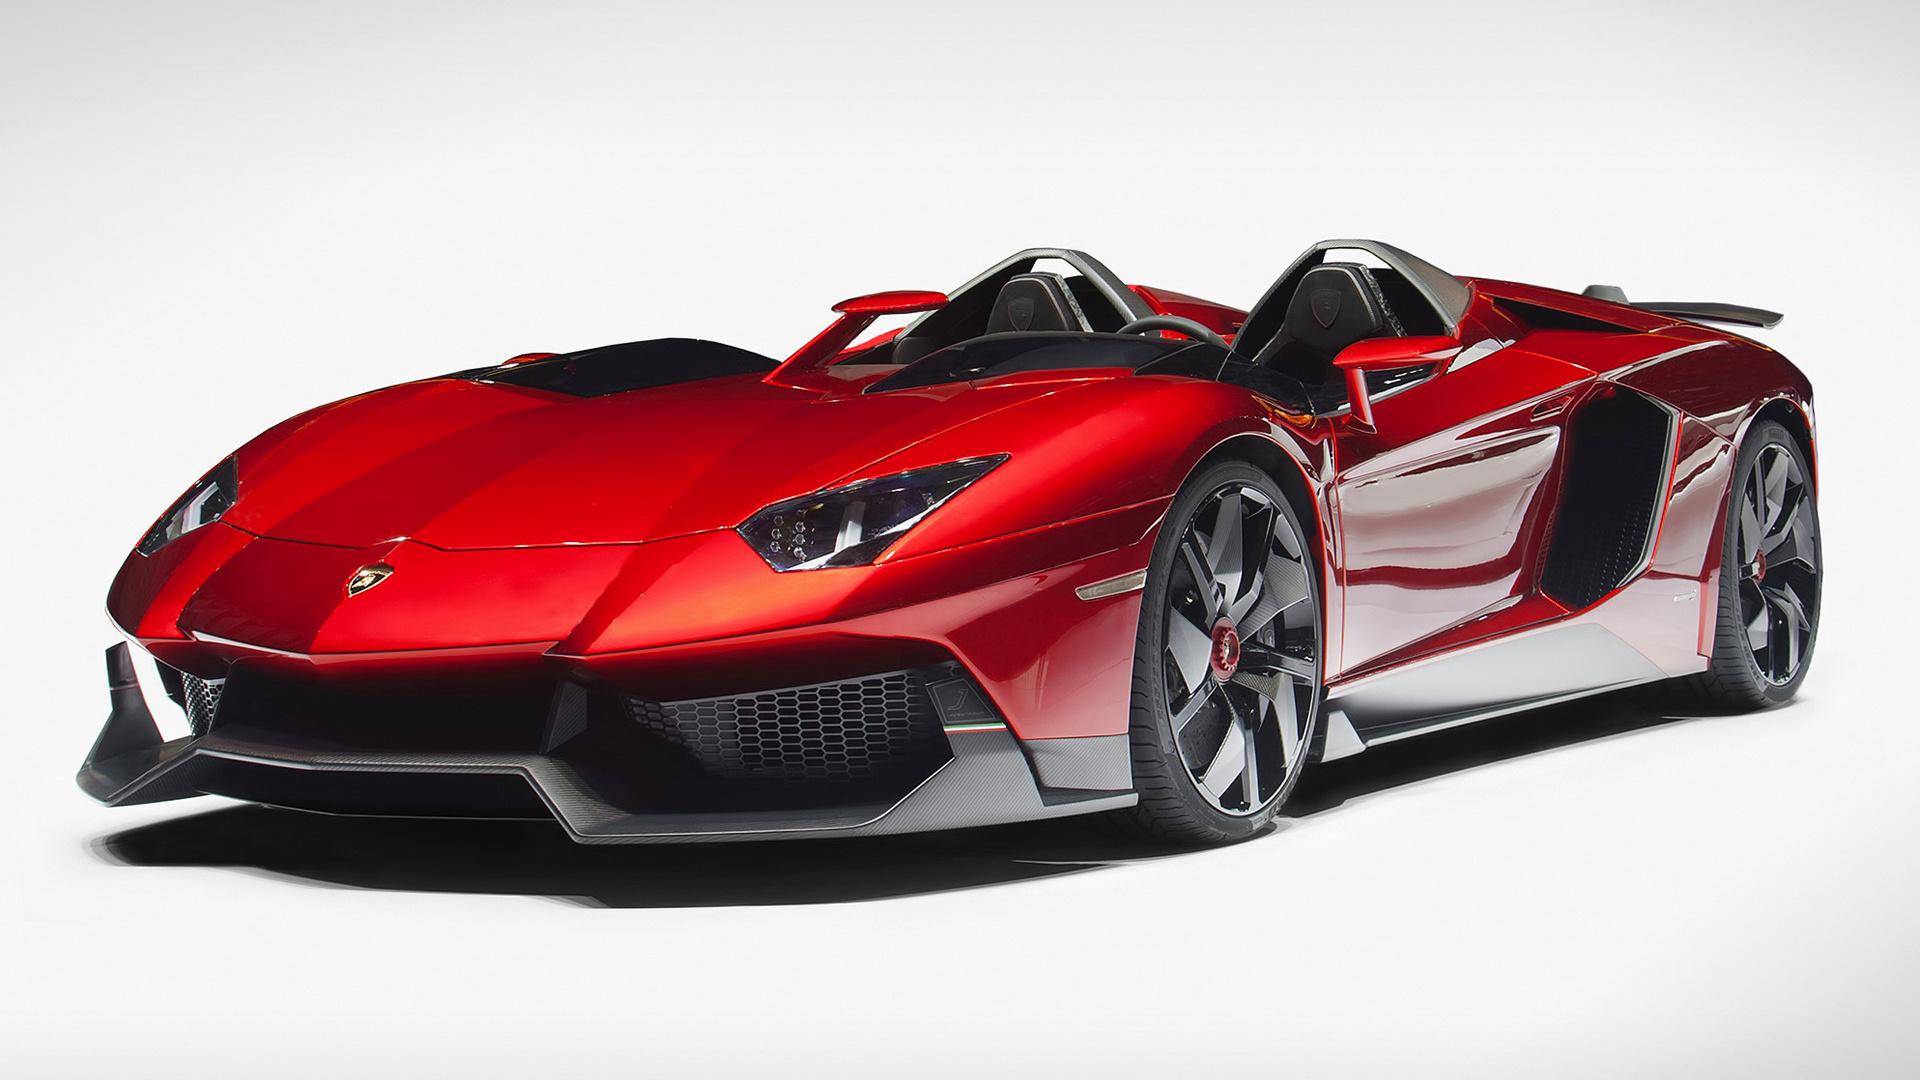 2012 Lamborghini Aventador J - Wallpapers and HD Images ...